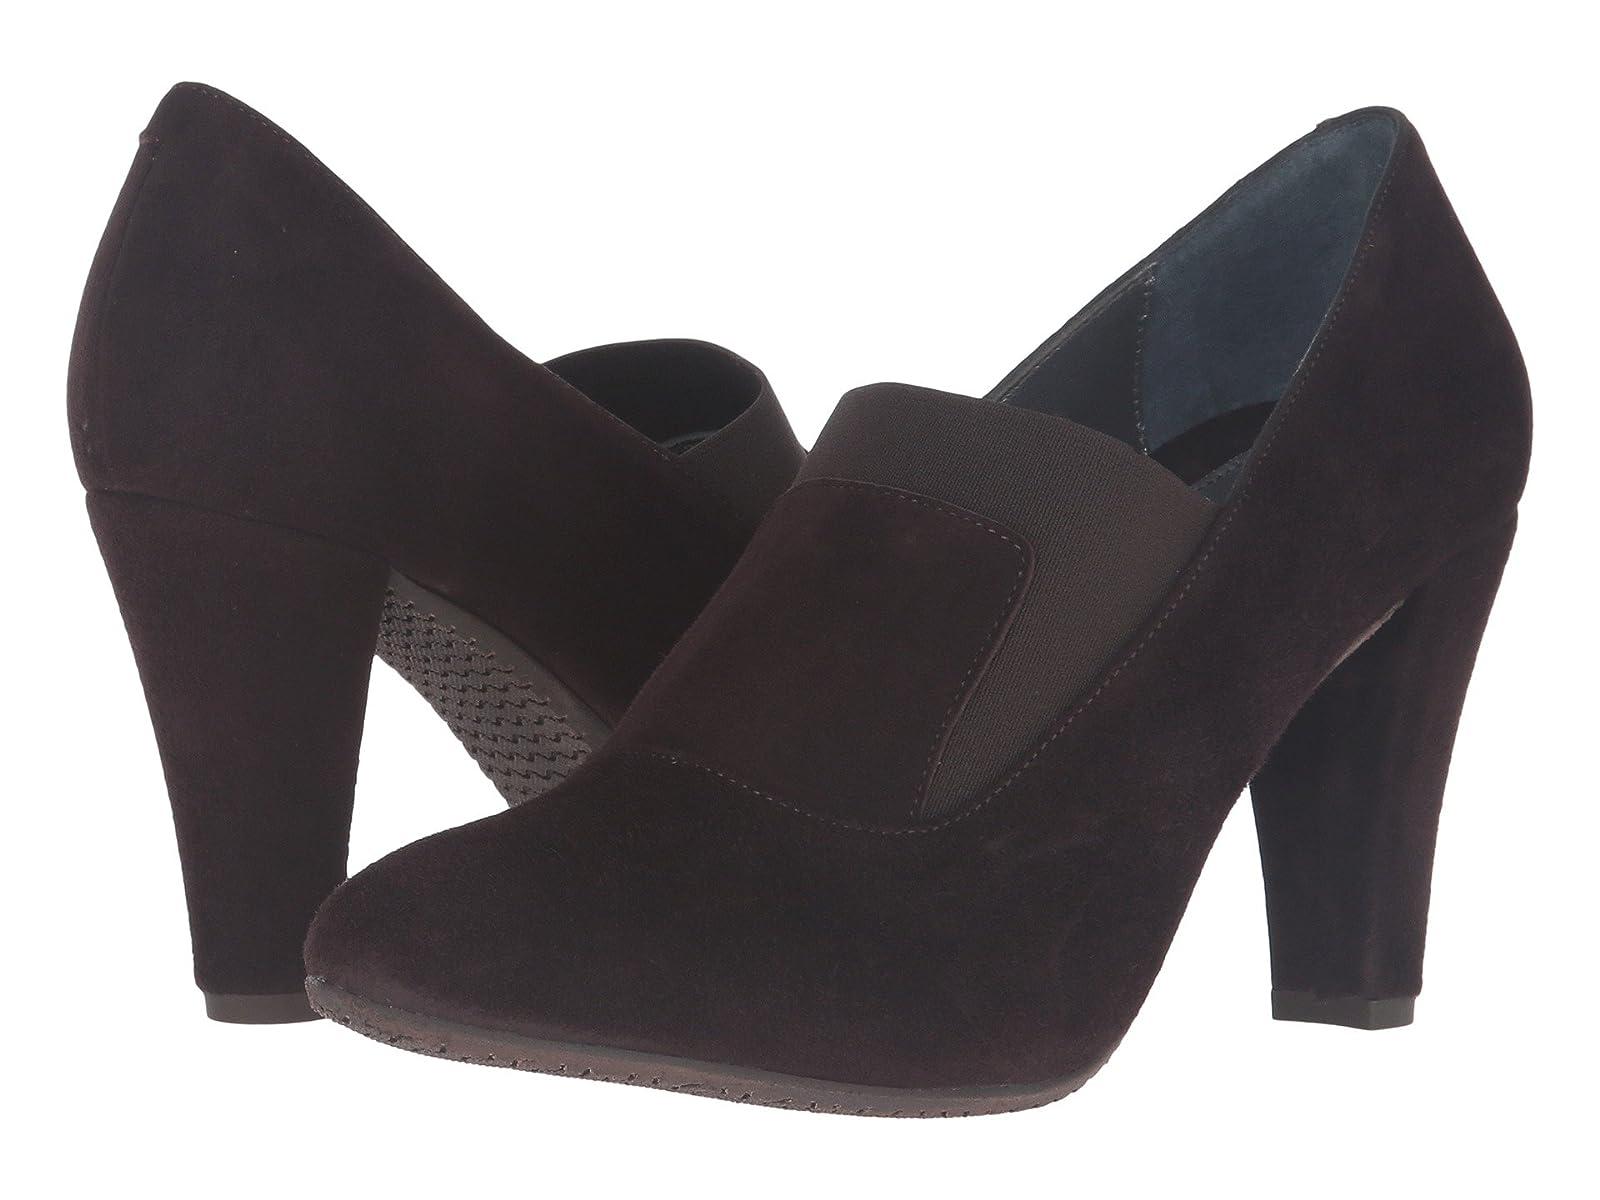 Eric Michael JillCheap and distinctive eye-catching shoes